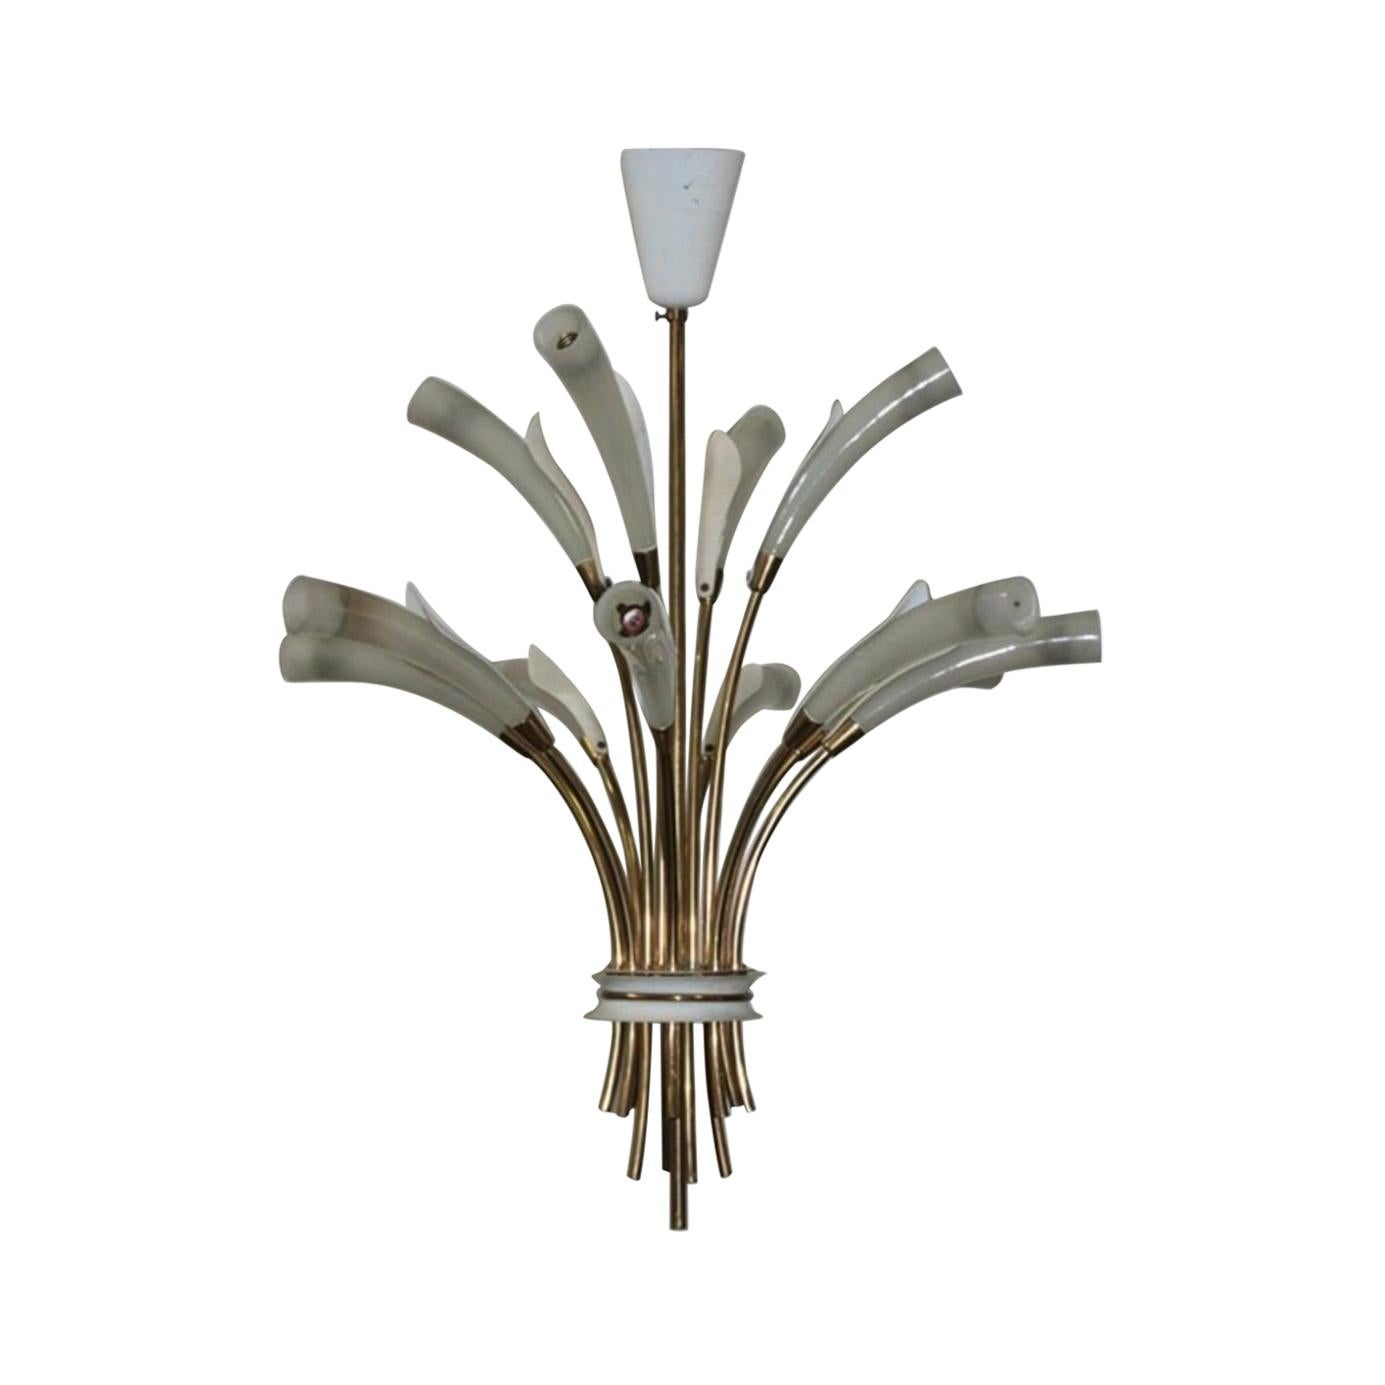 Midcentury Ceiling Light in the Style of Arredoluce Angelo Lelli